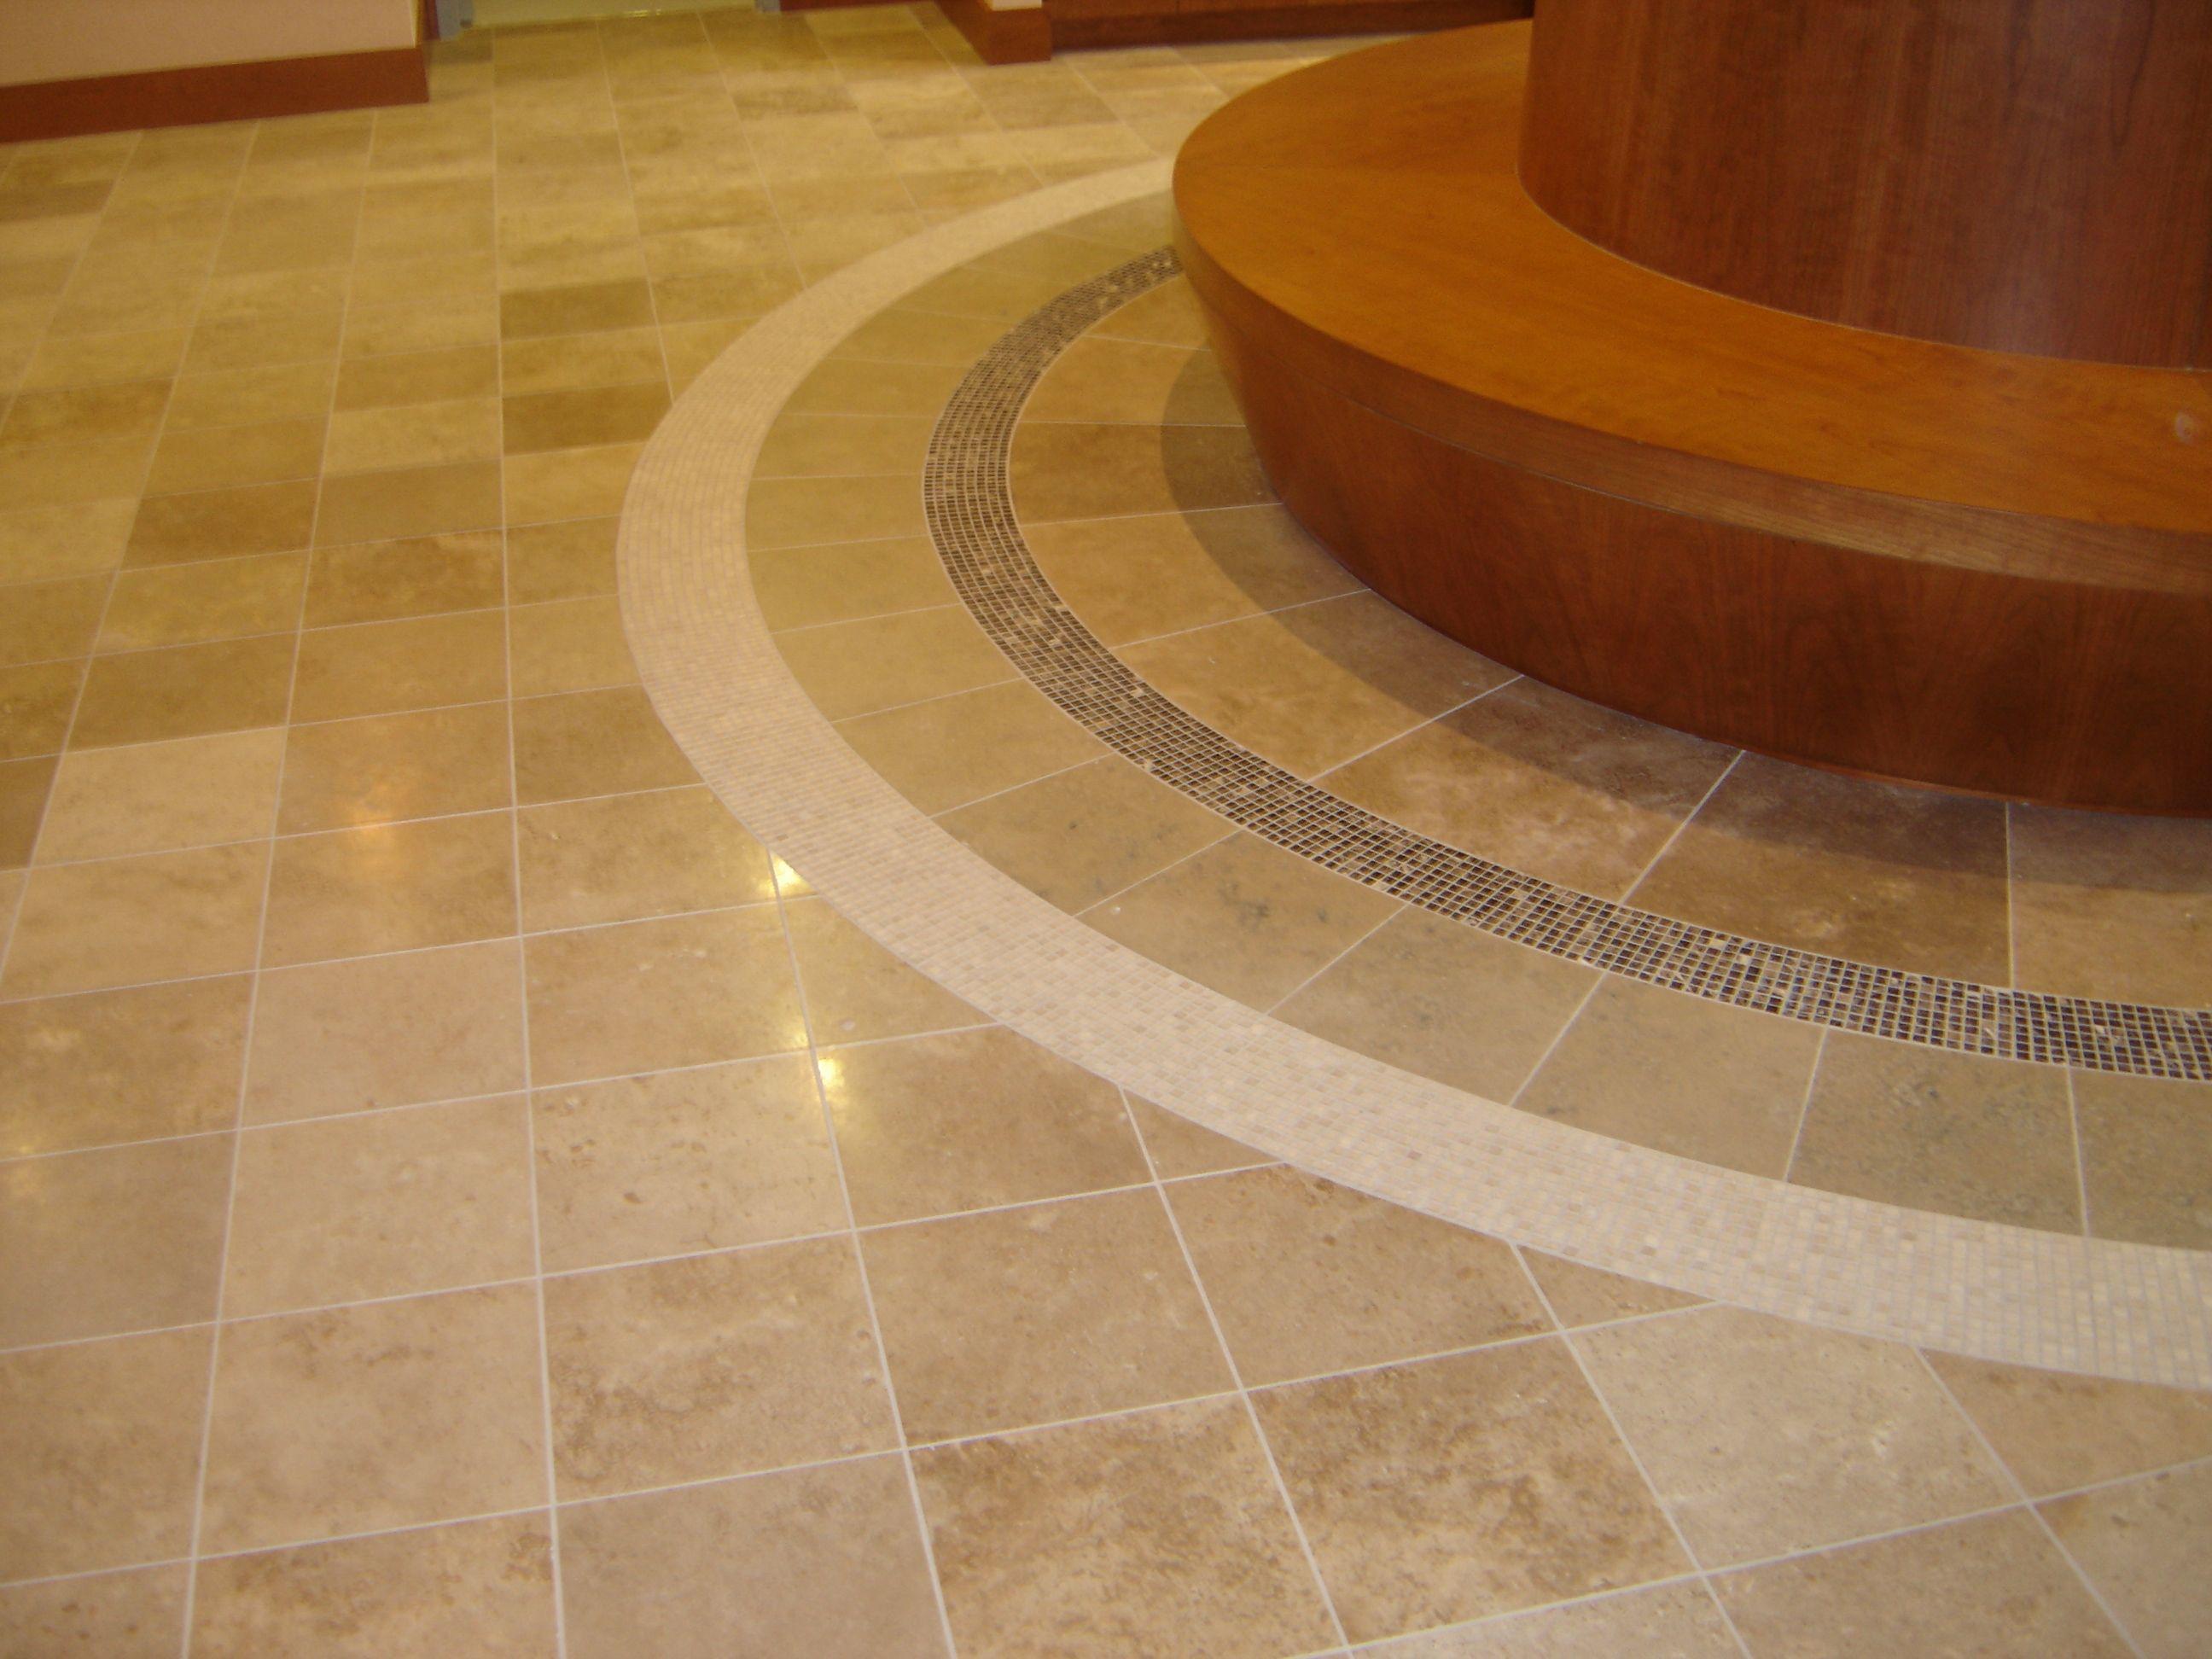 Travertine floor tile pattern ideas httpviajesairmar travertine floor tile pattern ideas dailygadgetfo Images